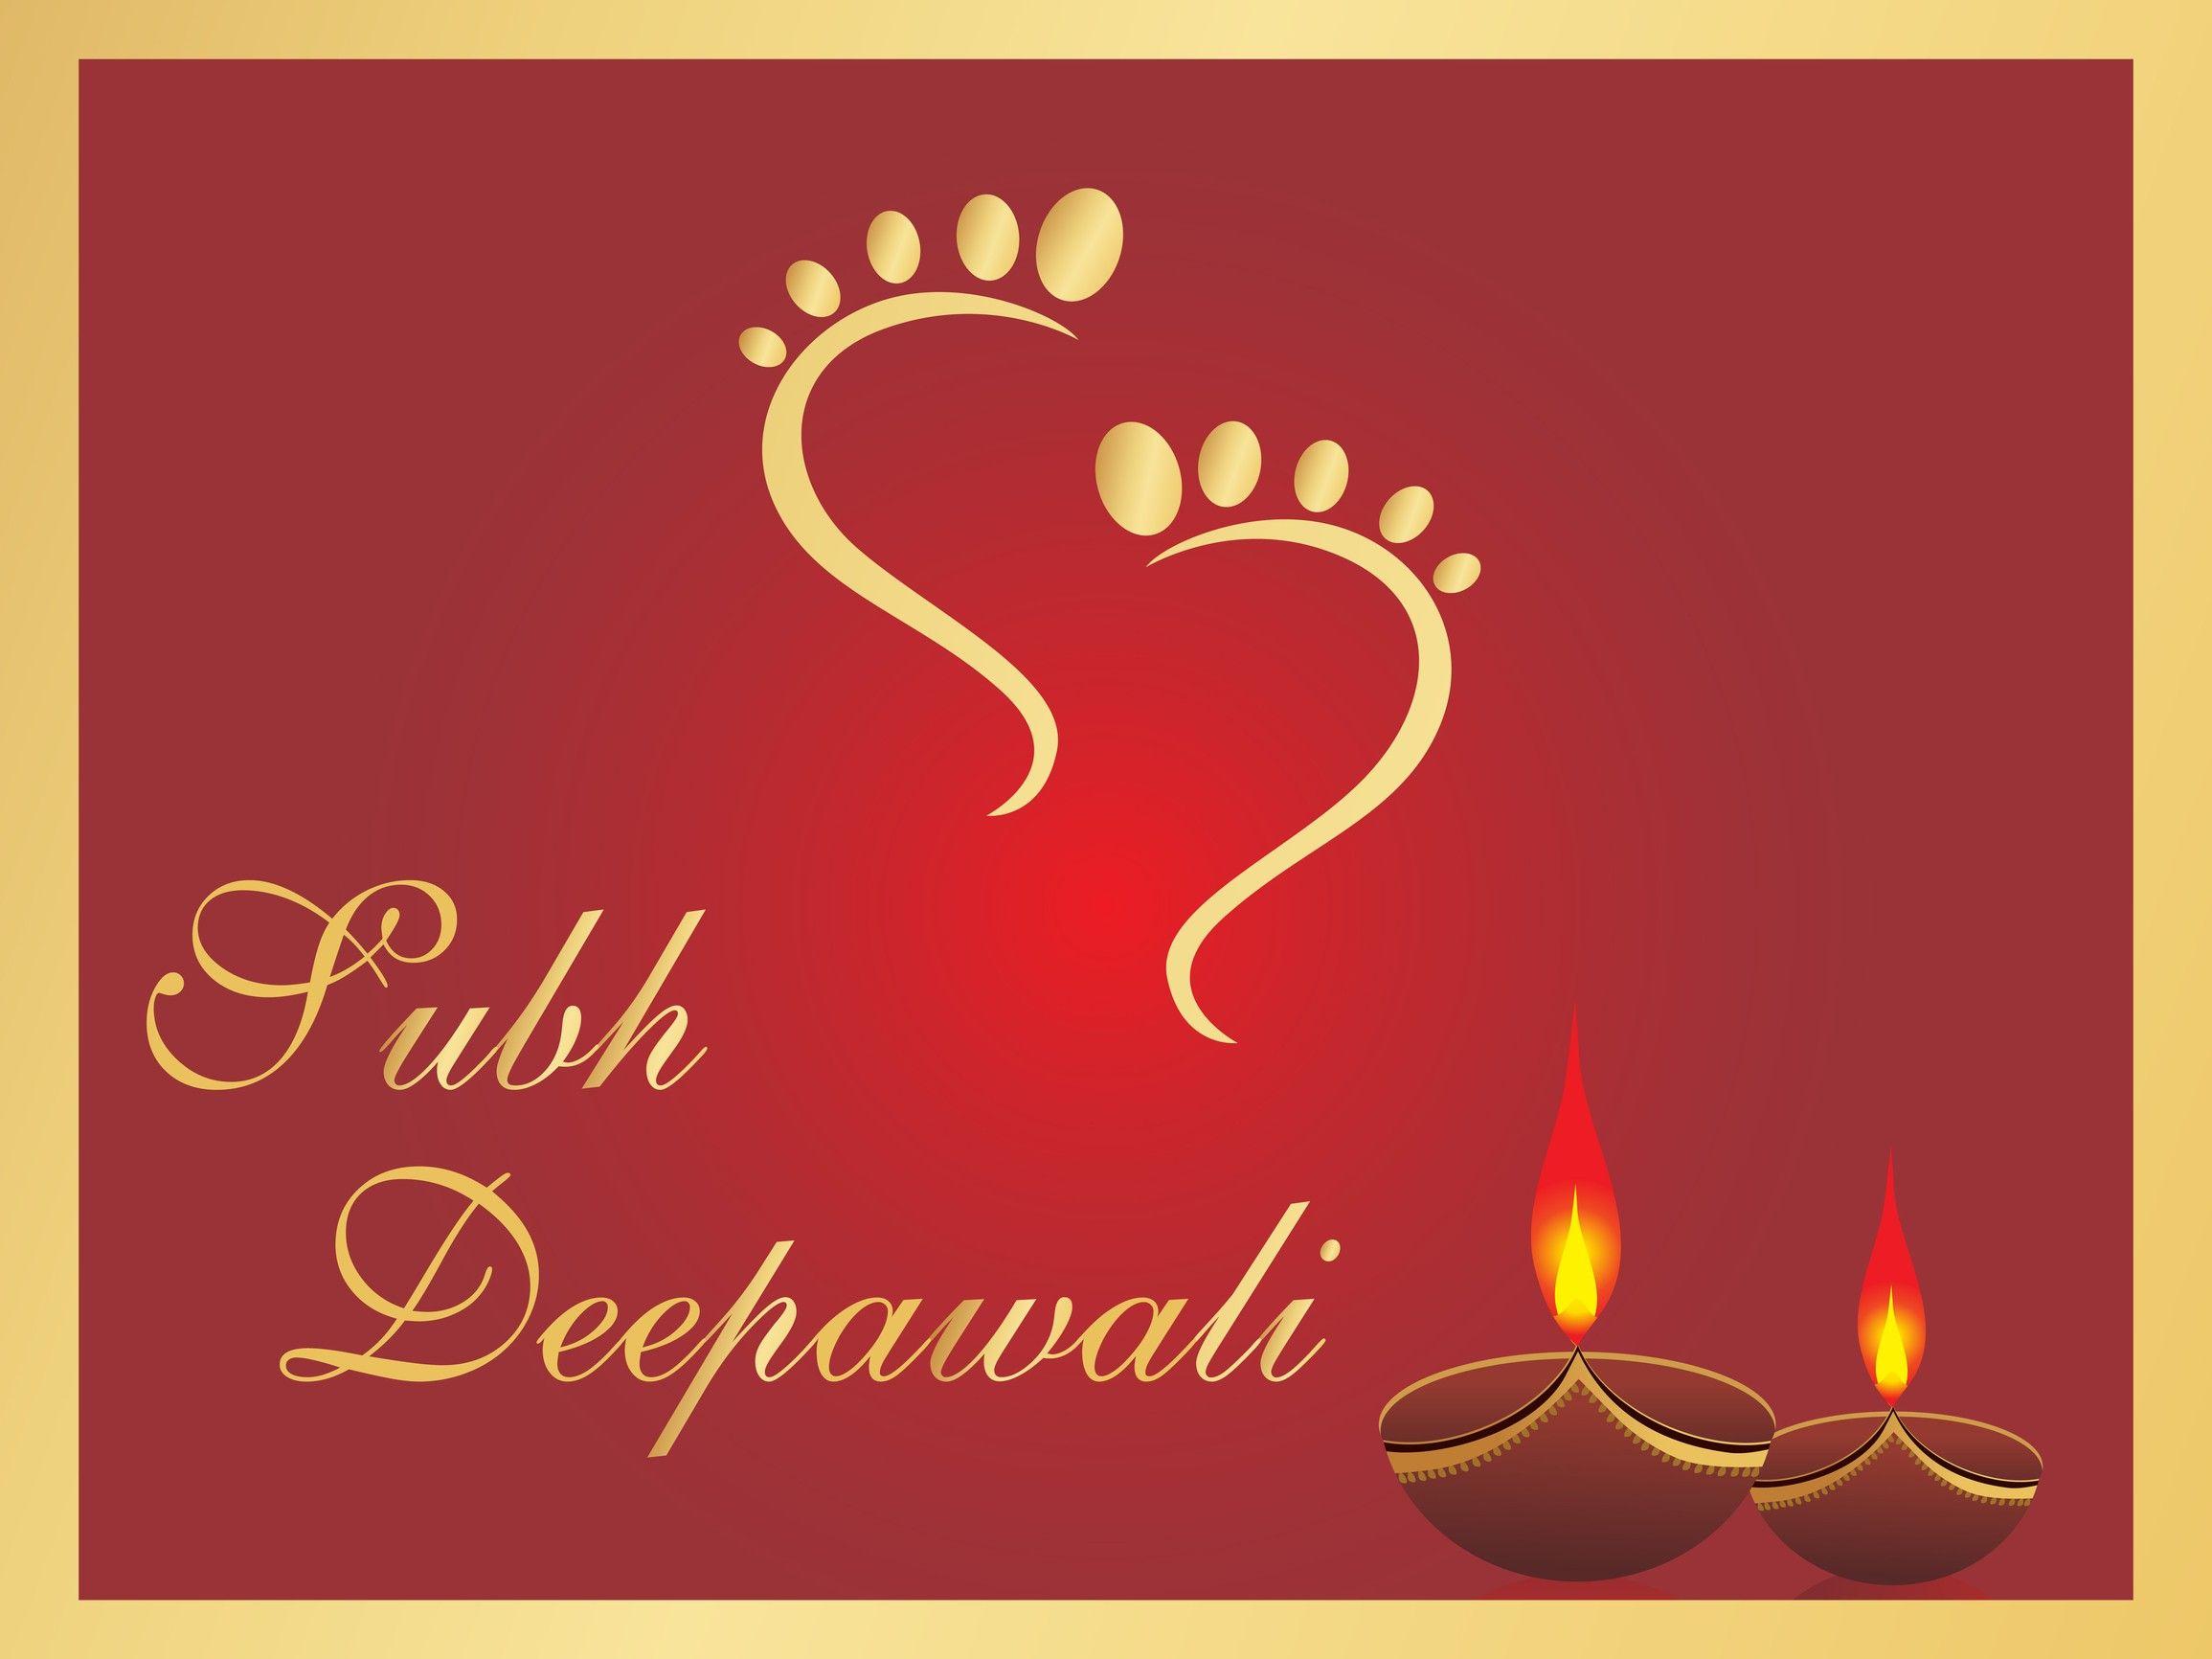 English happy diwali greetings images wallpapers happy diwali english happy diwali greetings images wallpapers happy diwali pinterest diwali greetings images happy diwali and diwali greetings kristyandbryce Gallery